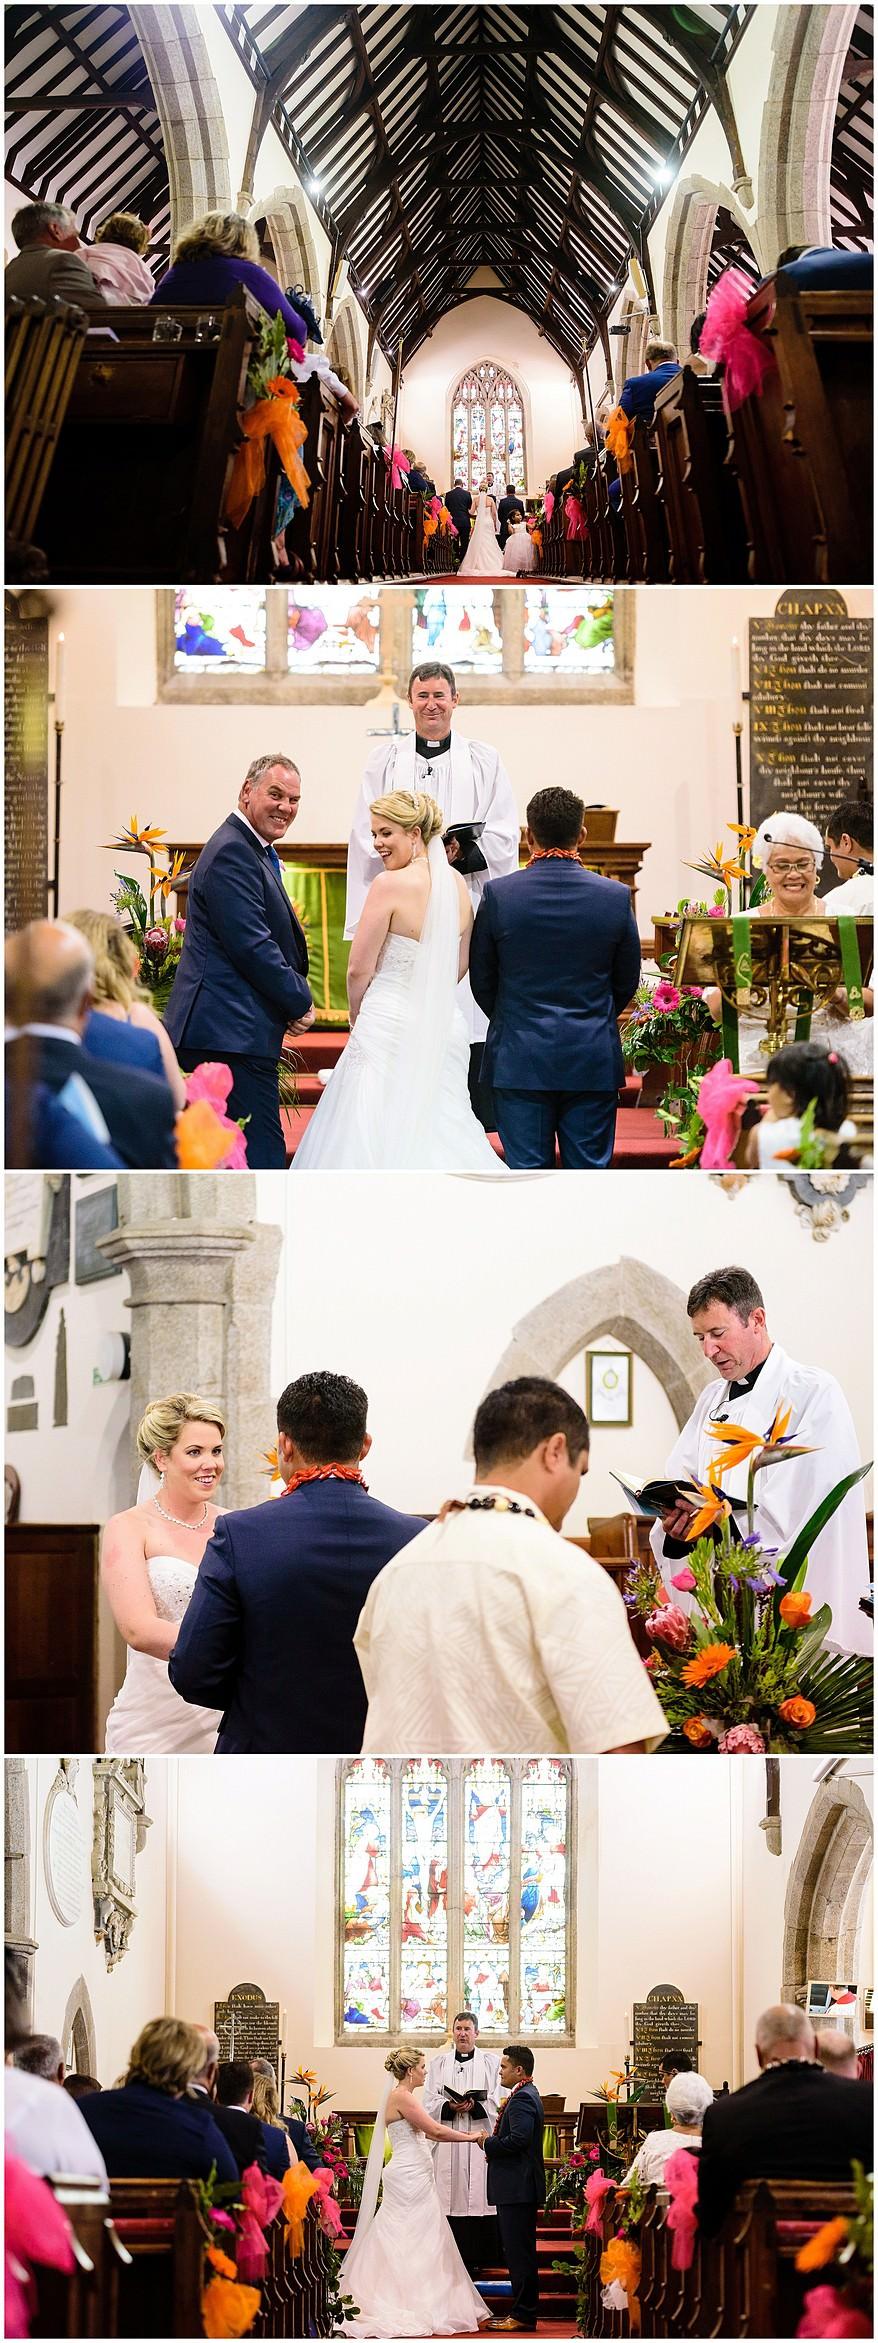 wedding at Illogan church in Cornwall